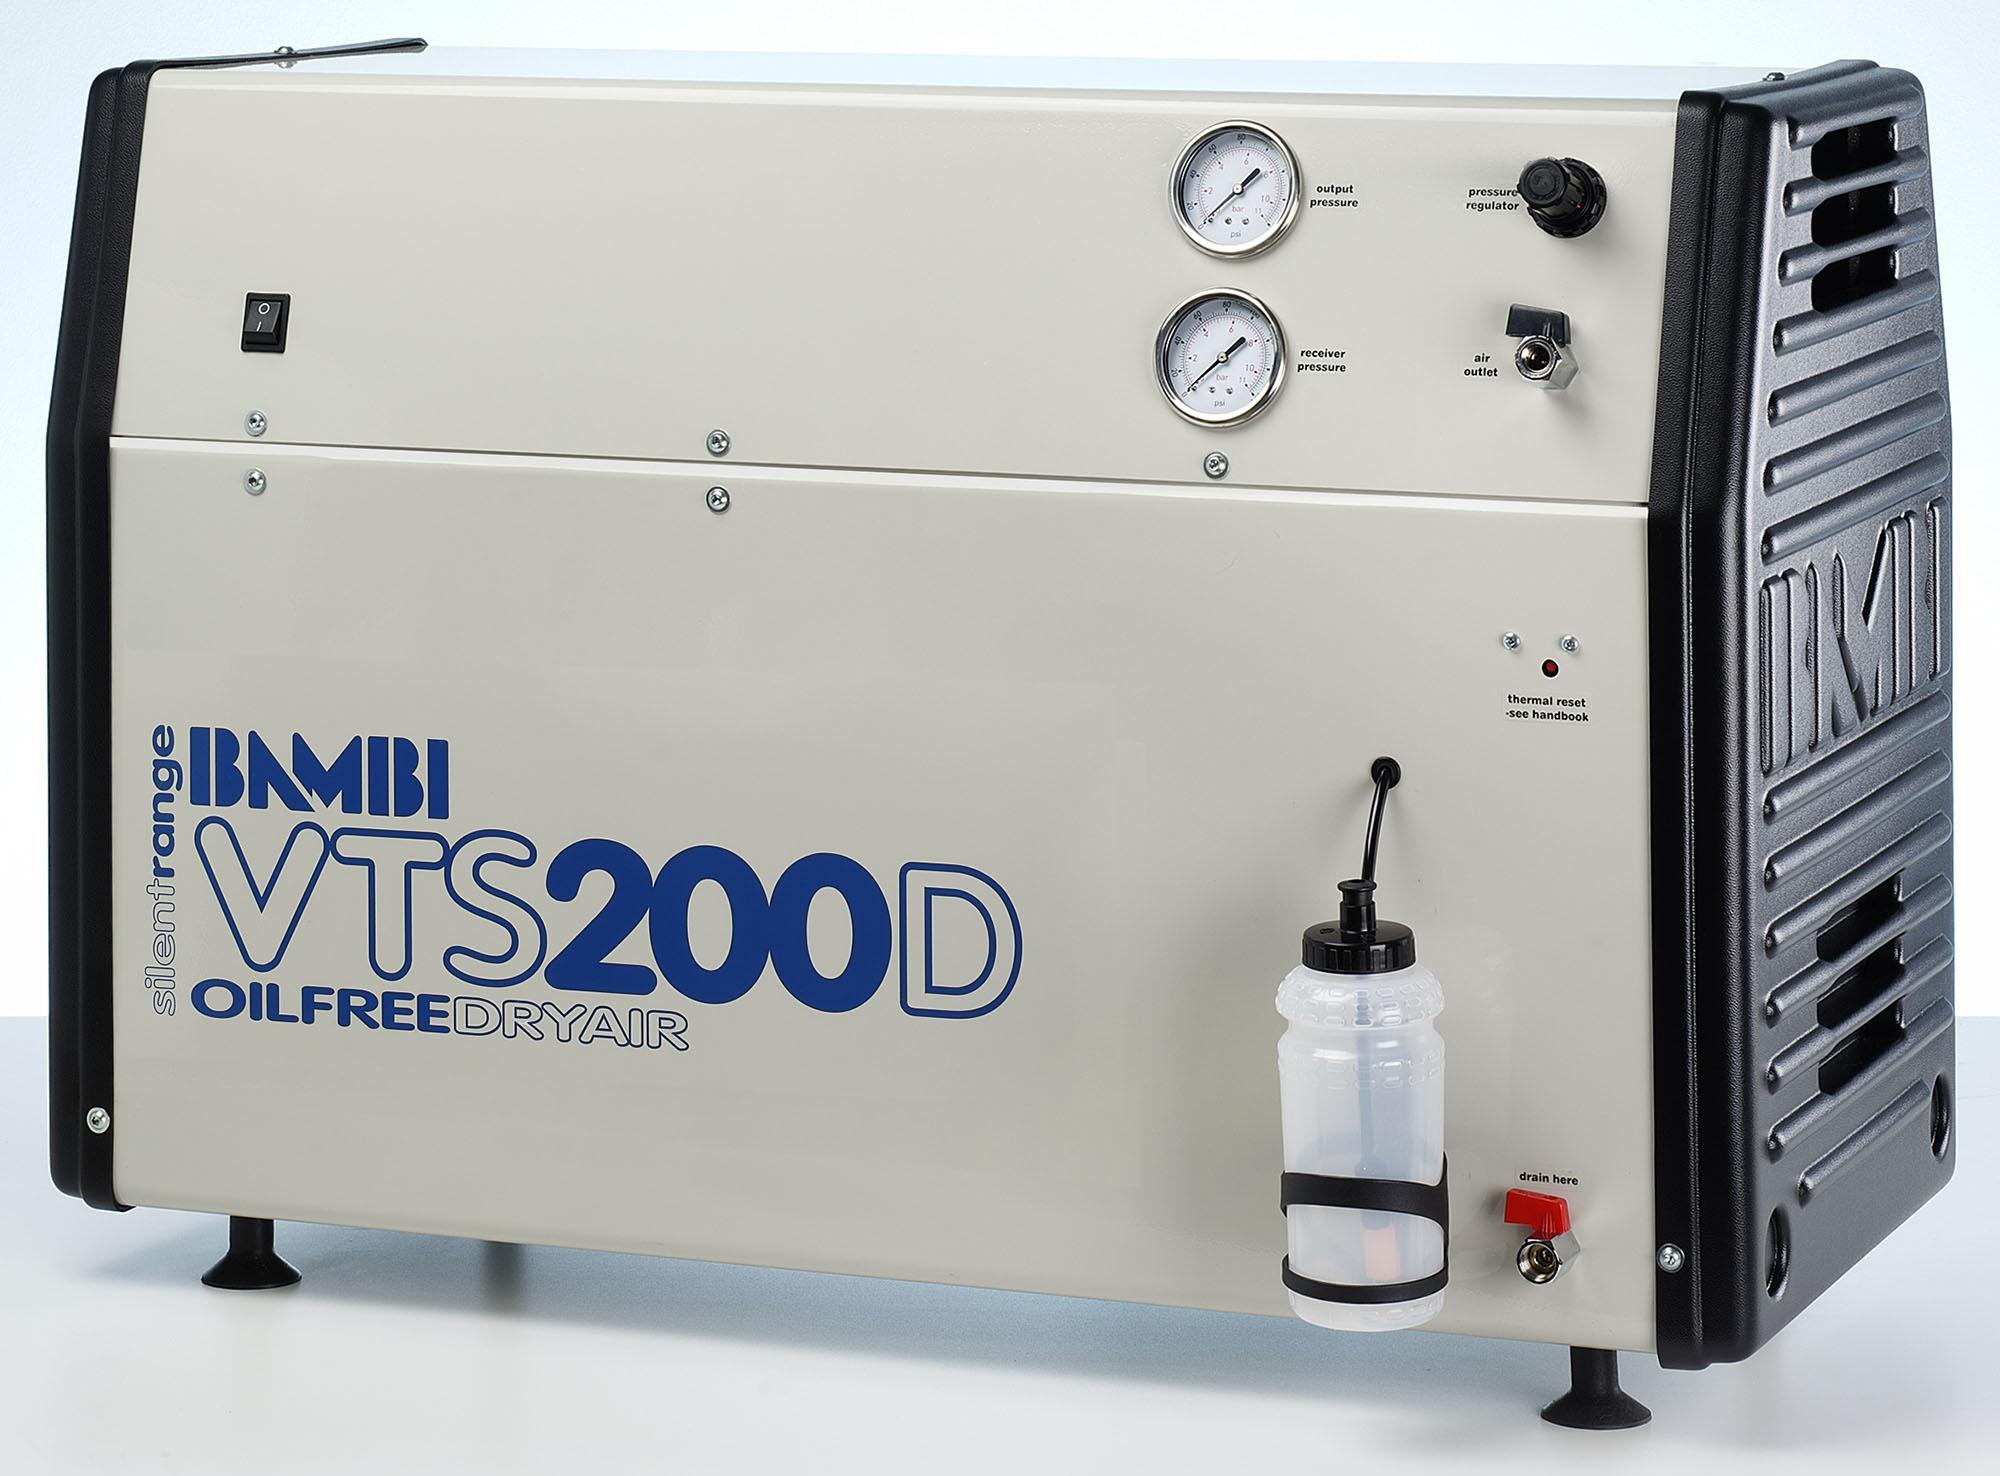 Midlands UK supplier of Bambi VTS200D air compressor